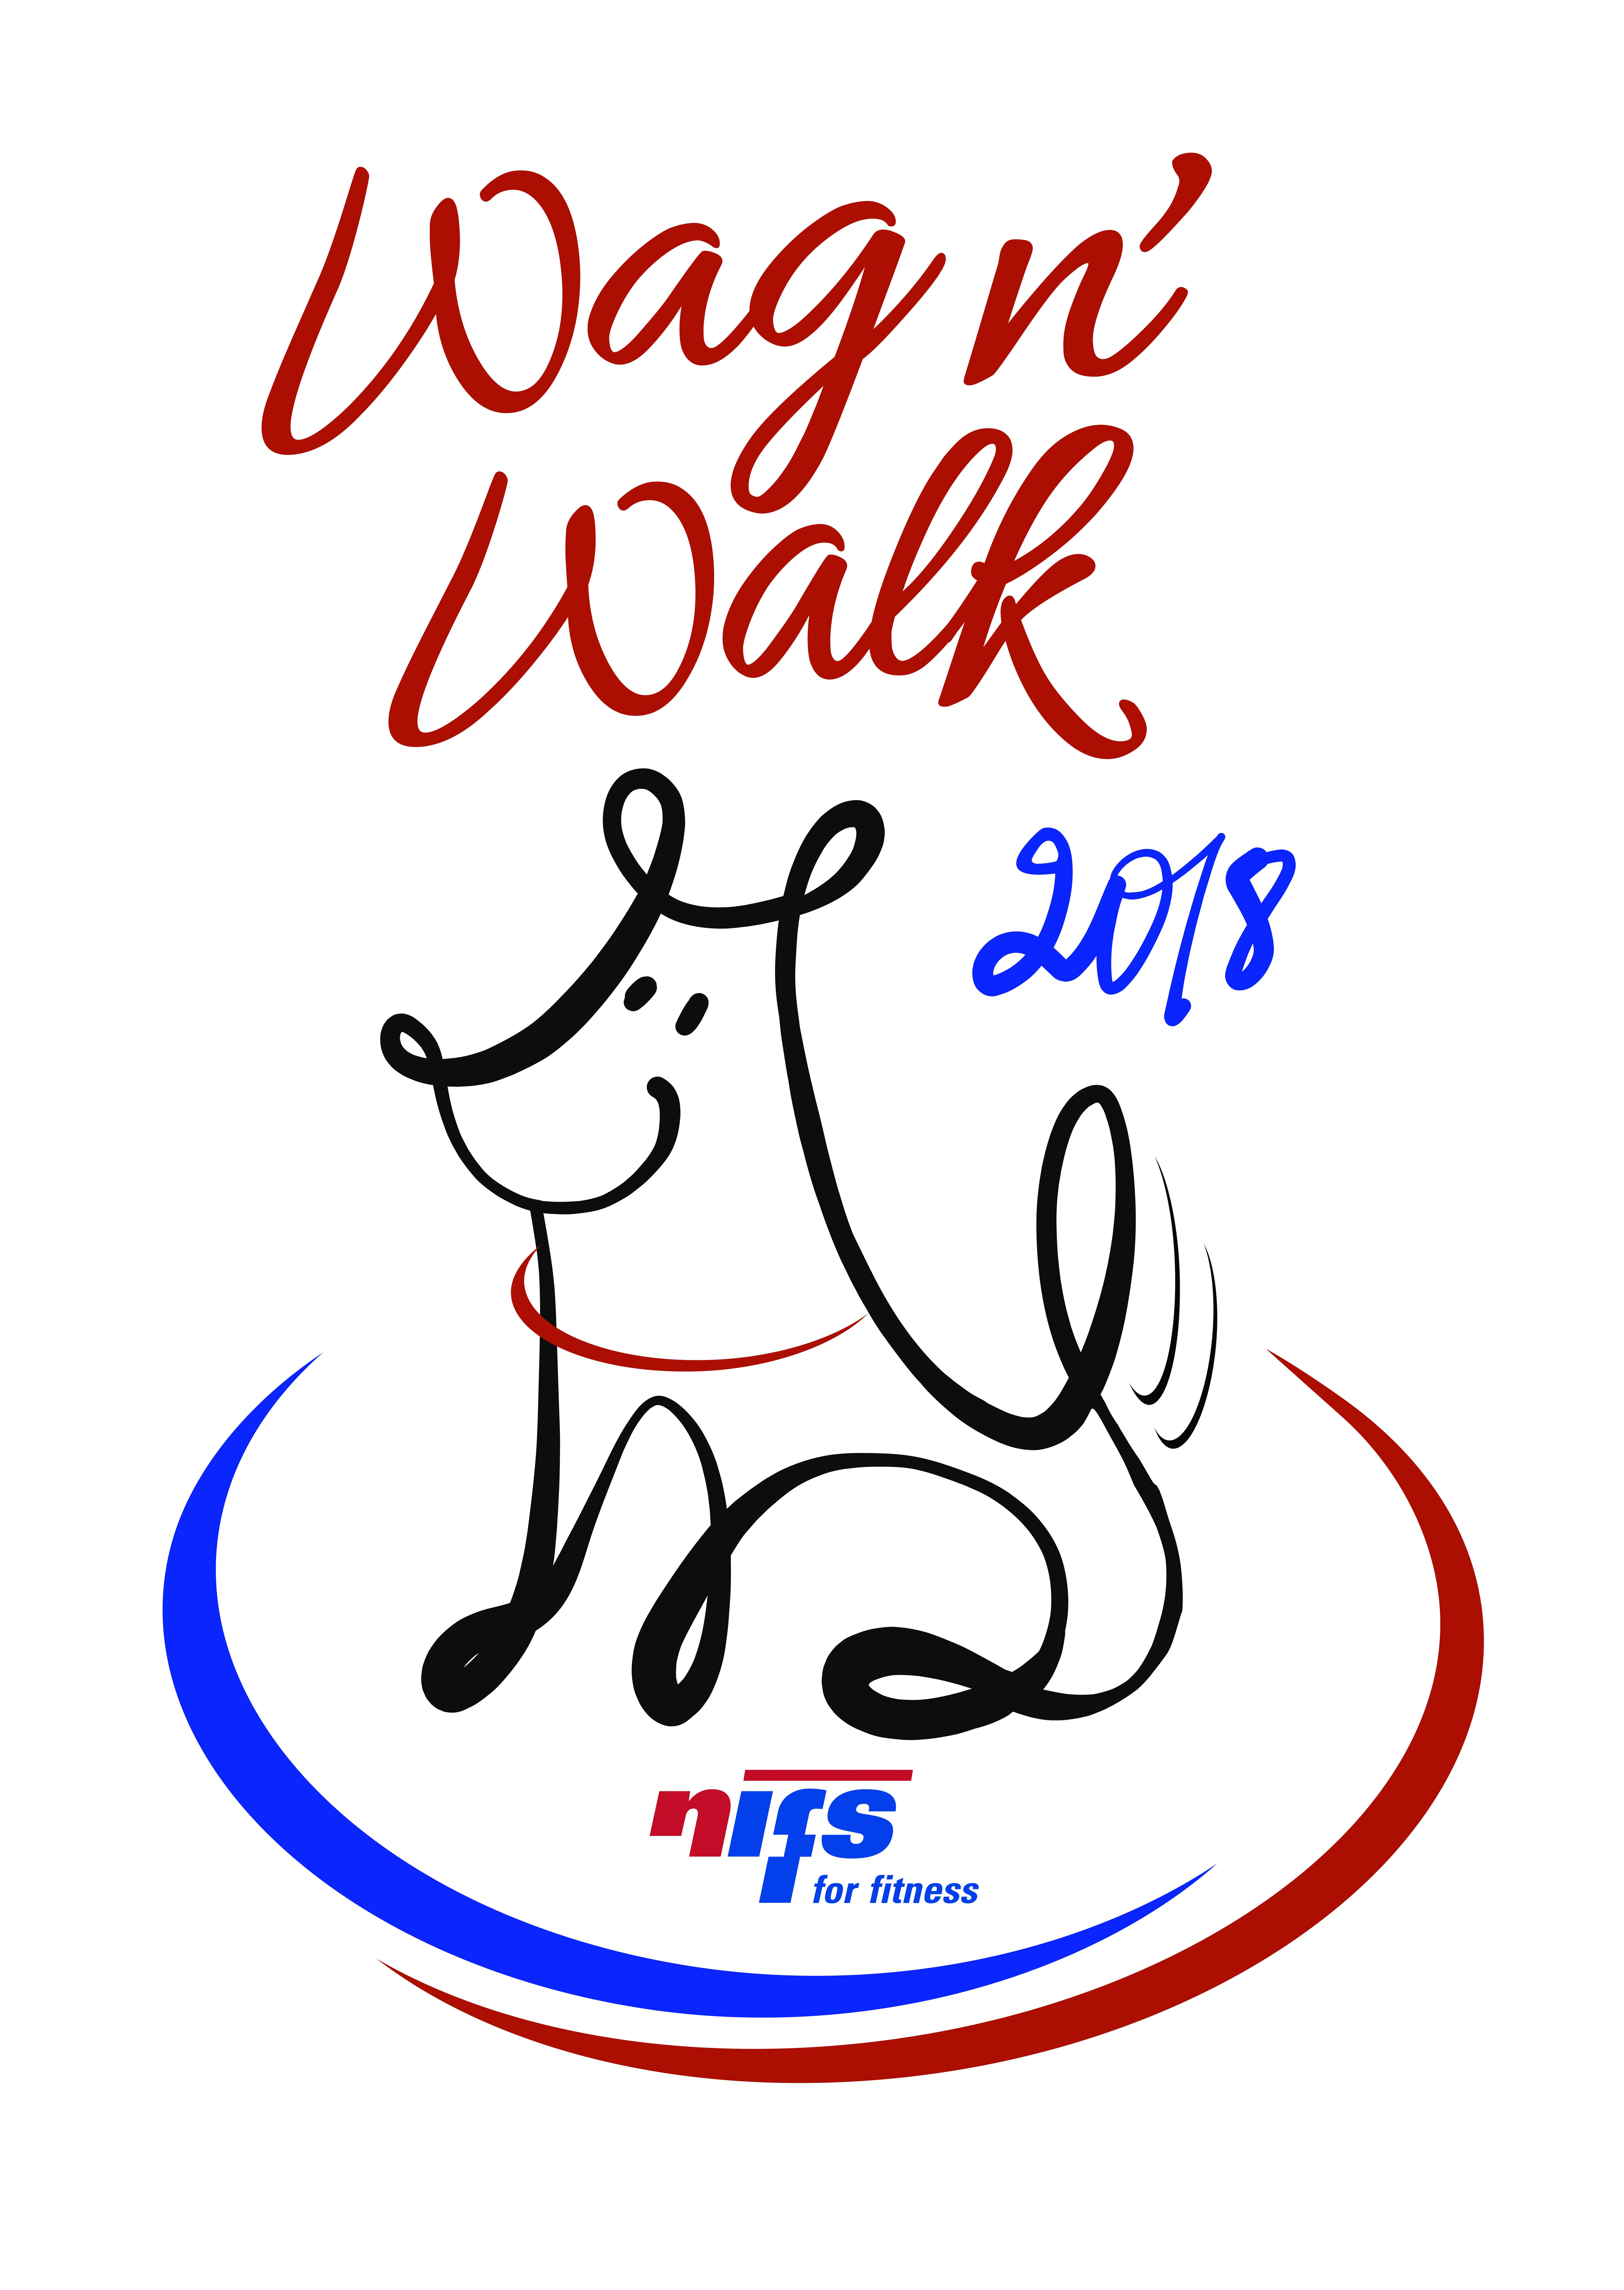 Wag and walk logo_2